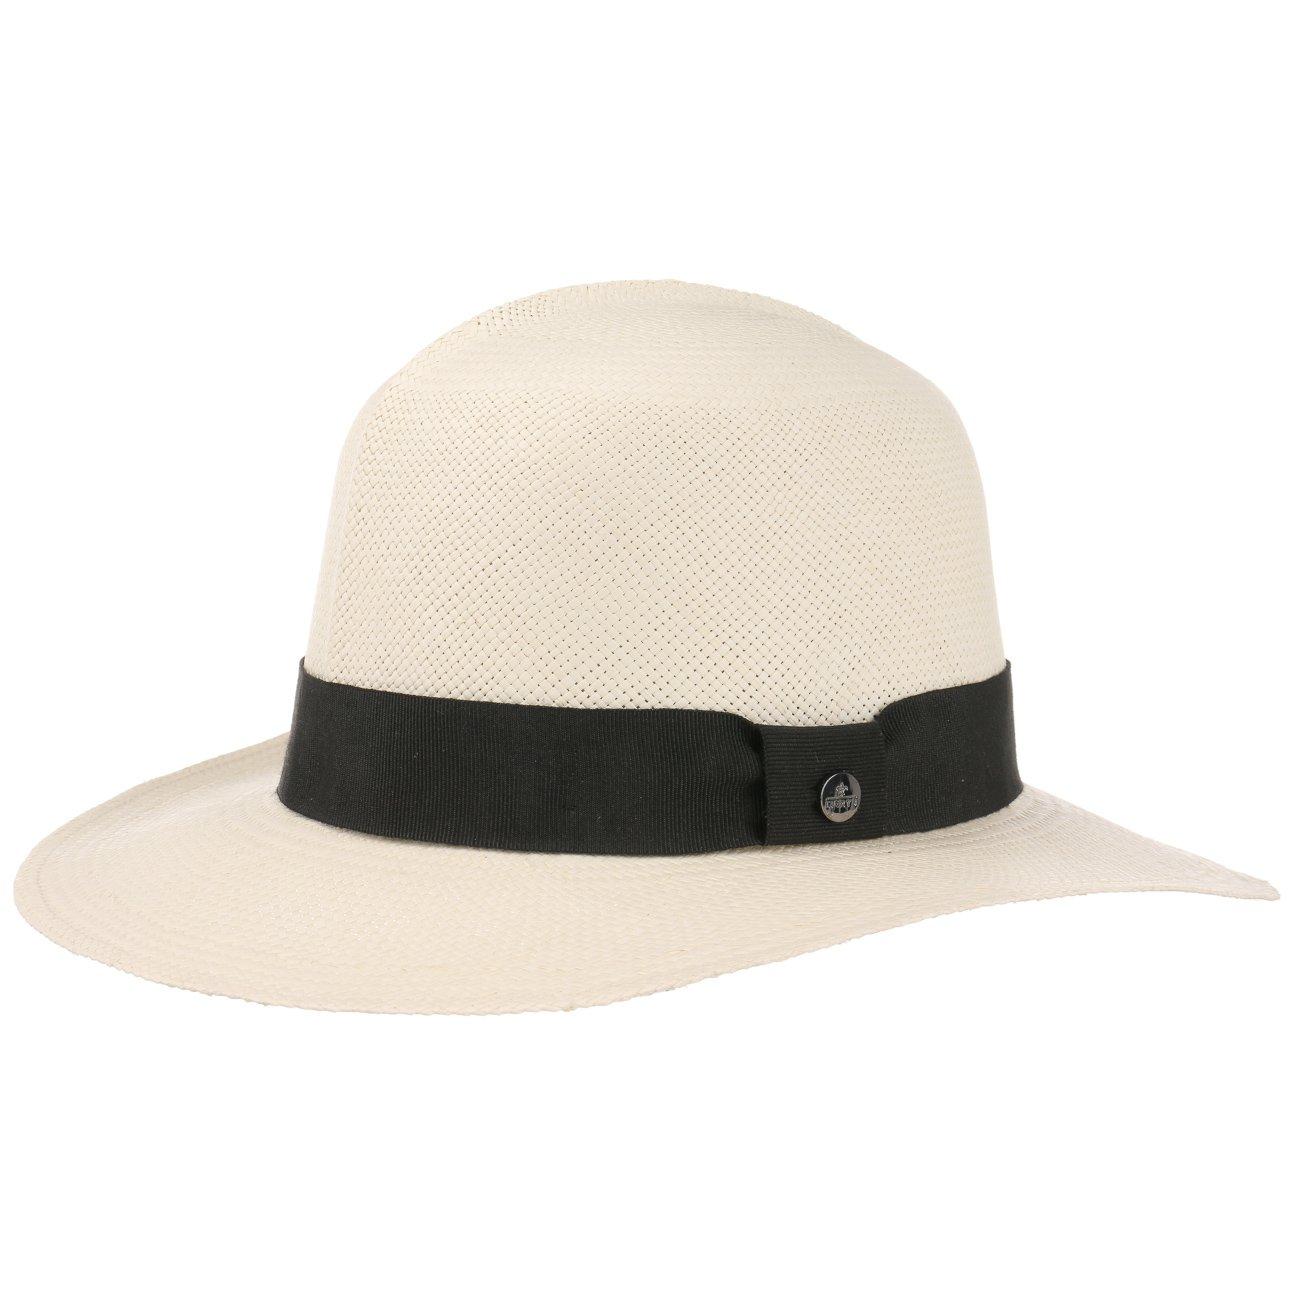 Made in Ecuador Fr/ühling-Sommer Lierys Colonial Panamahut Strohhut Hut Panamastrohhut Sommerhut Sonnenhut Herrenhut Damenhut Damen//Herren